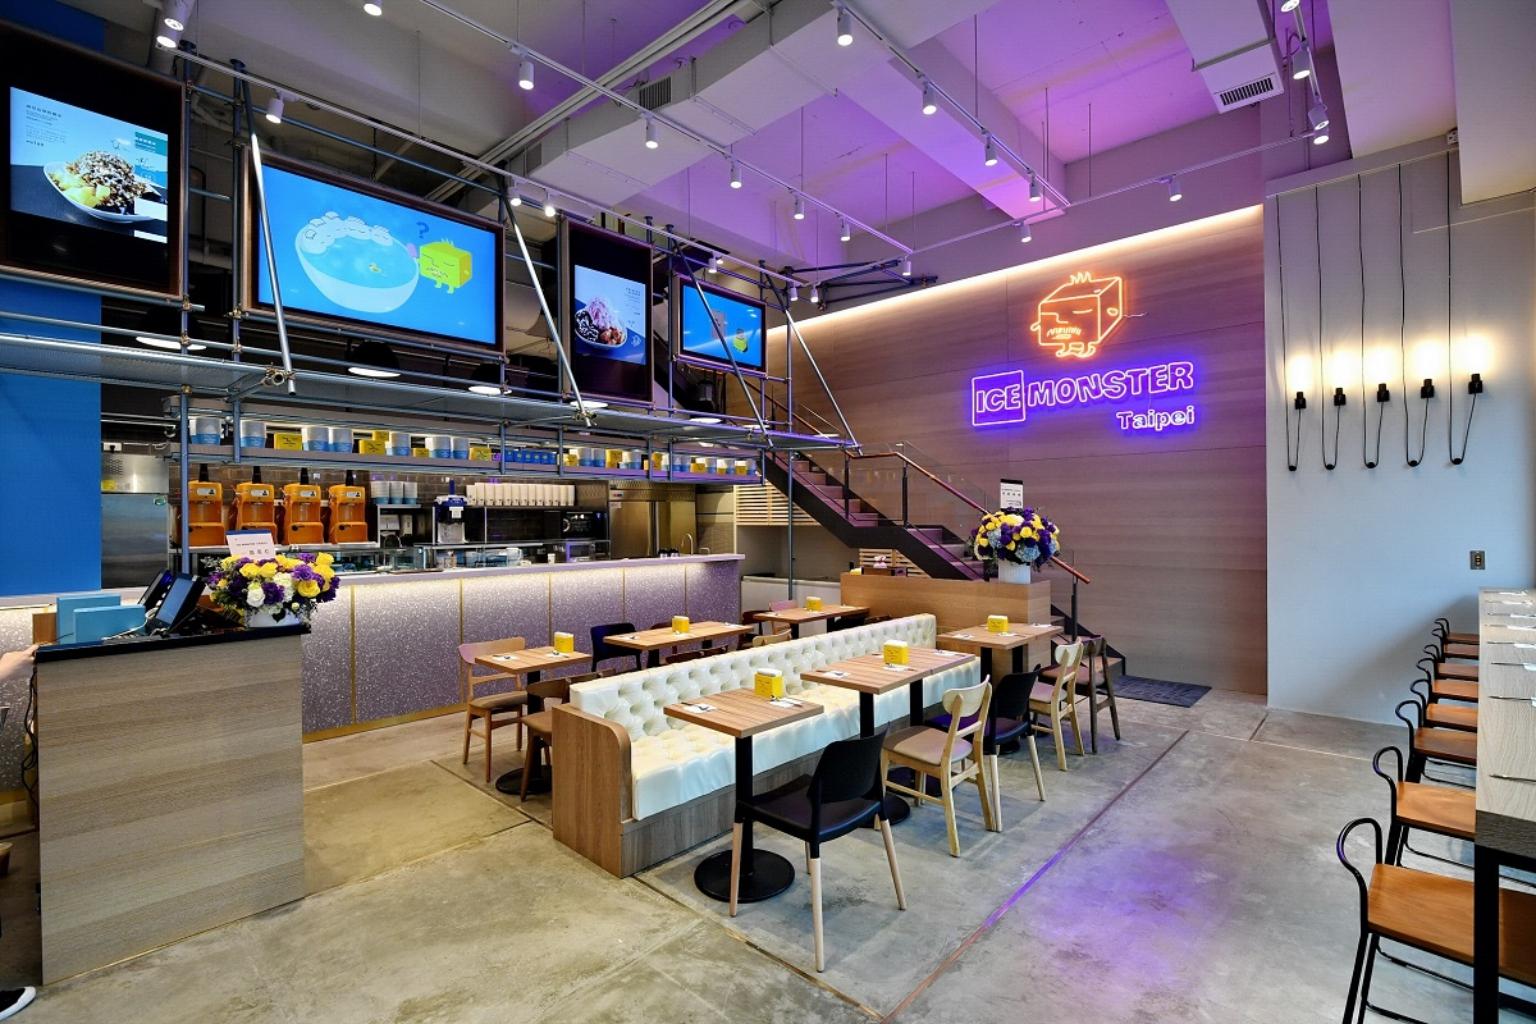 Ice Monster永康創始店擁有明亮的簡約設計與逗趣擺飾,打造令人會心一笑的舒適空間